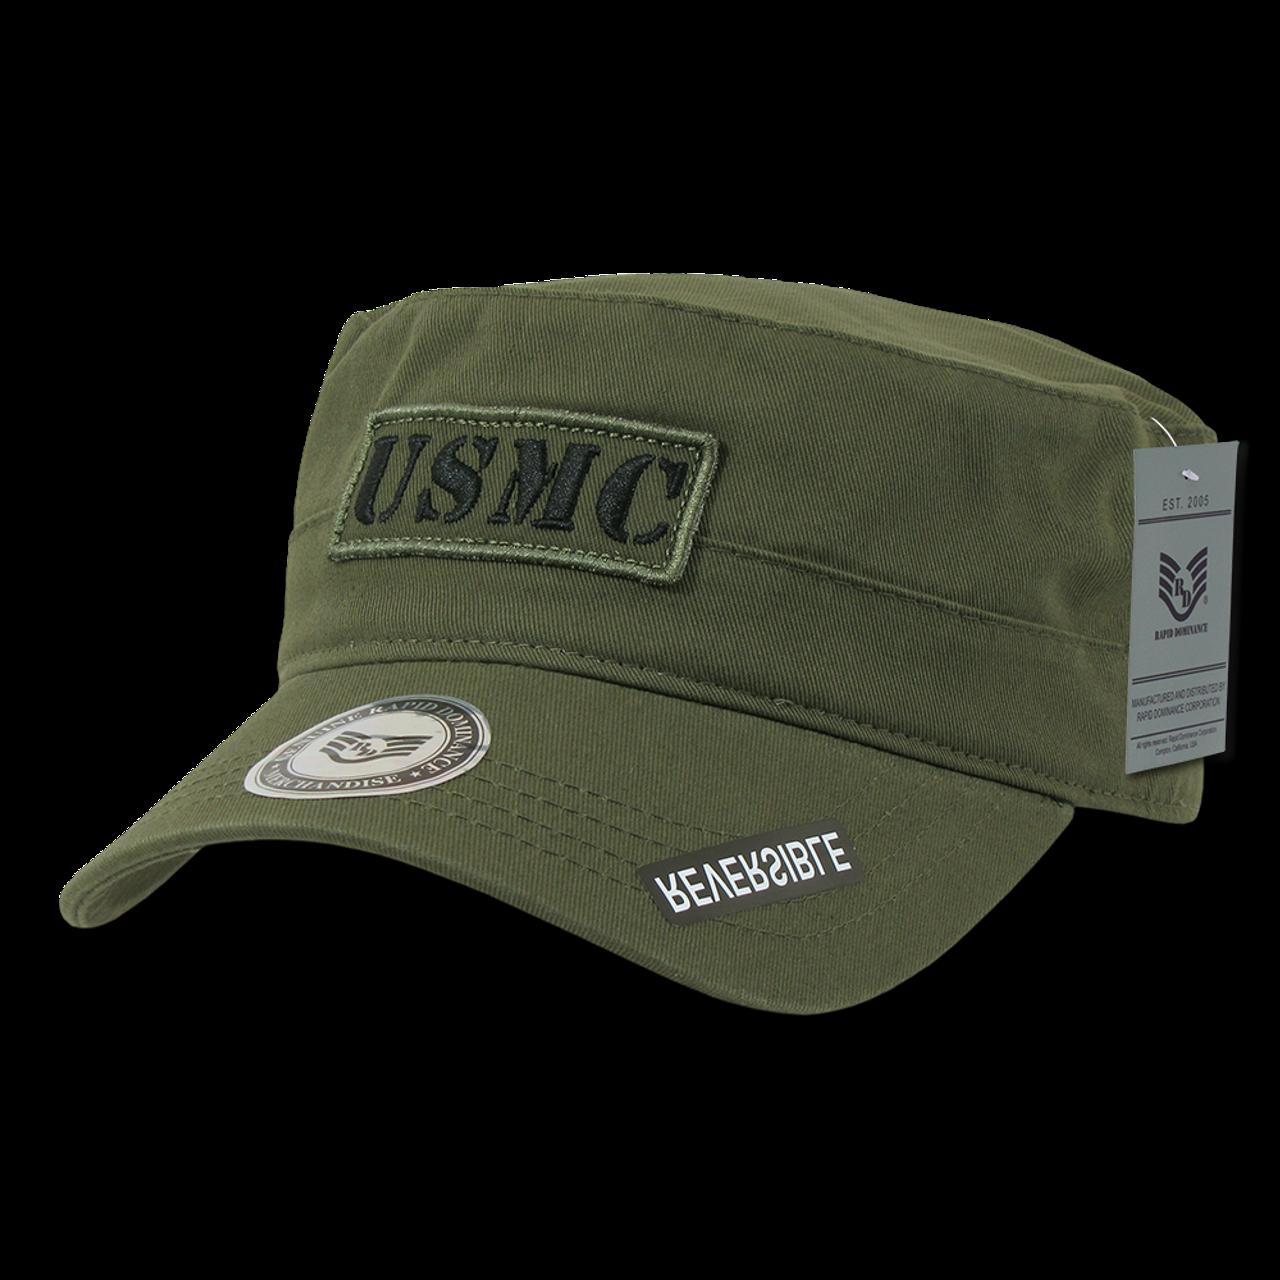 S88 - Marines USMC Cap Vintage Military Style Reversible Olive Drab -  USMILITARYHATS.COM 0f2738eeb67